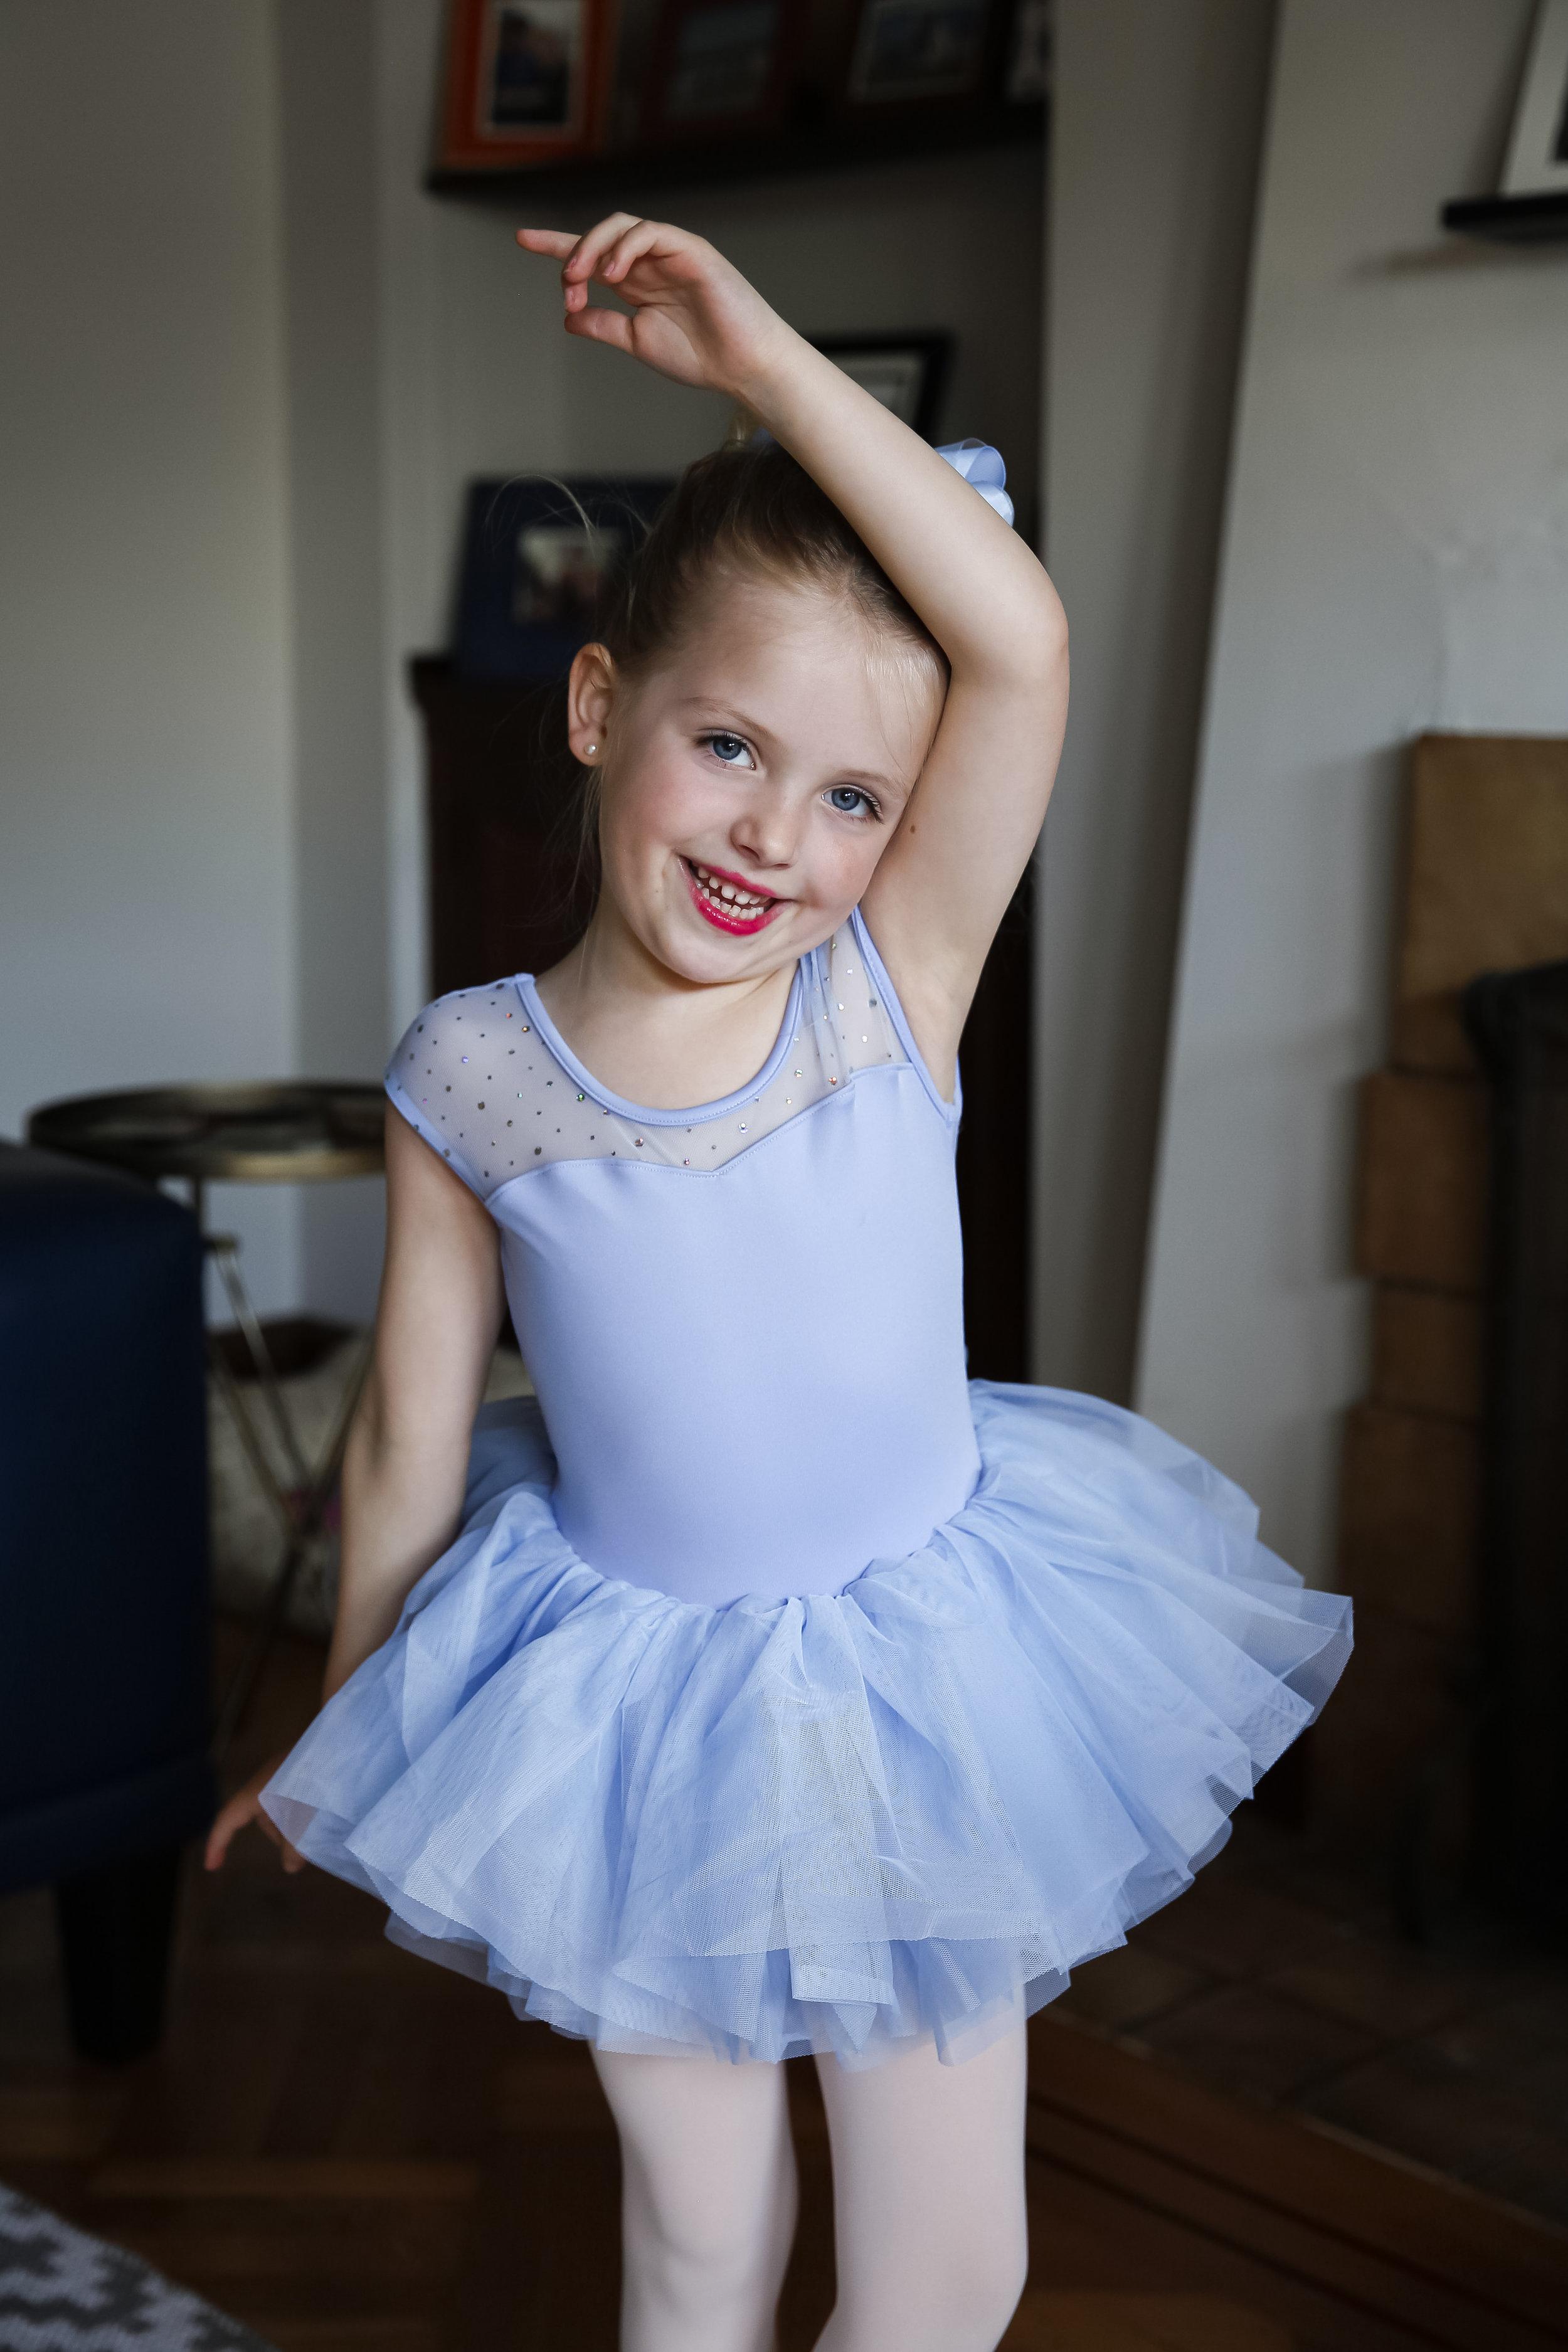 ballerina-ahp-00003.jpg